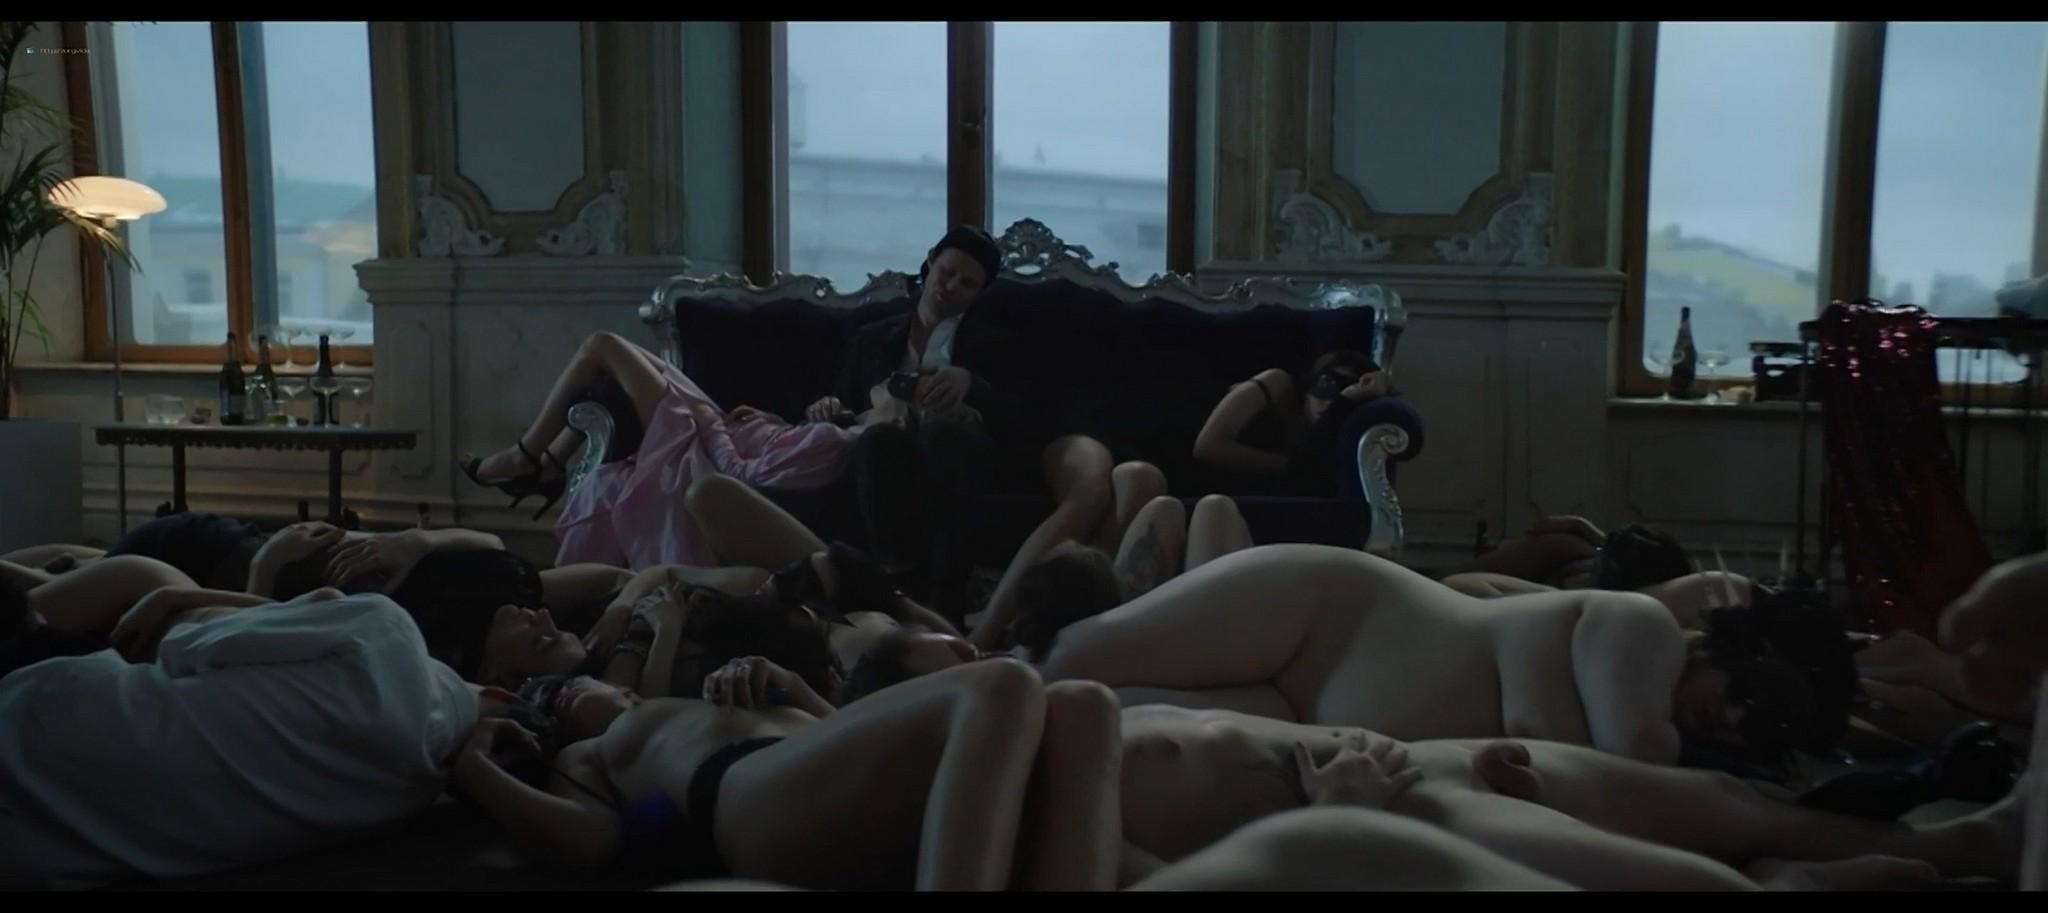 Elena Tronina nude sex Lukerya Ilyashenko Lyubov Tolkalina and others nude Happy End RU 2021 s1e6 7 8 1080p 12